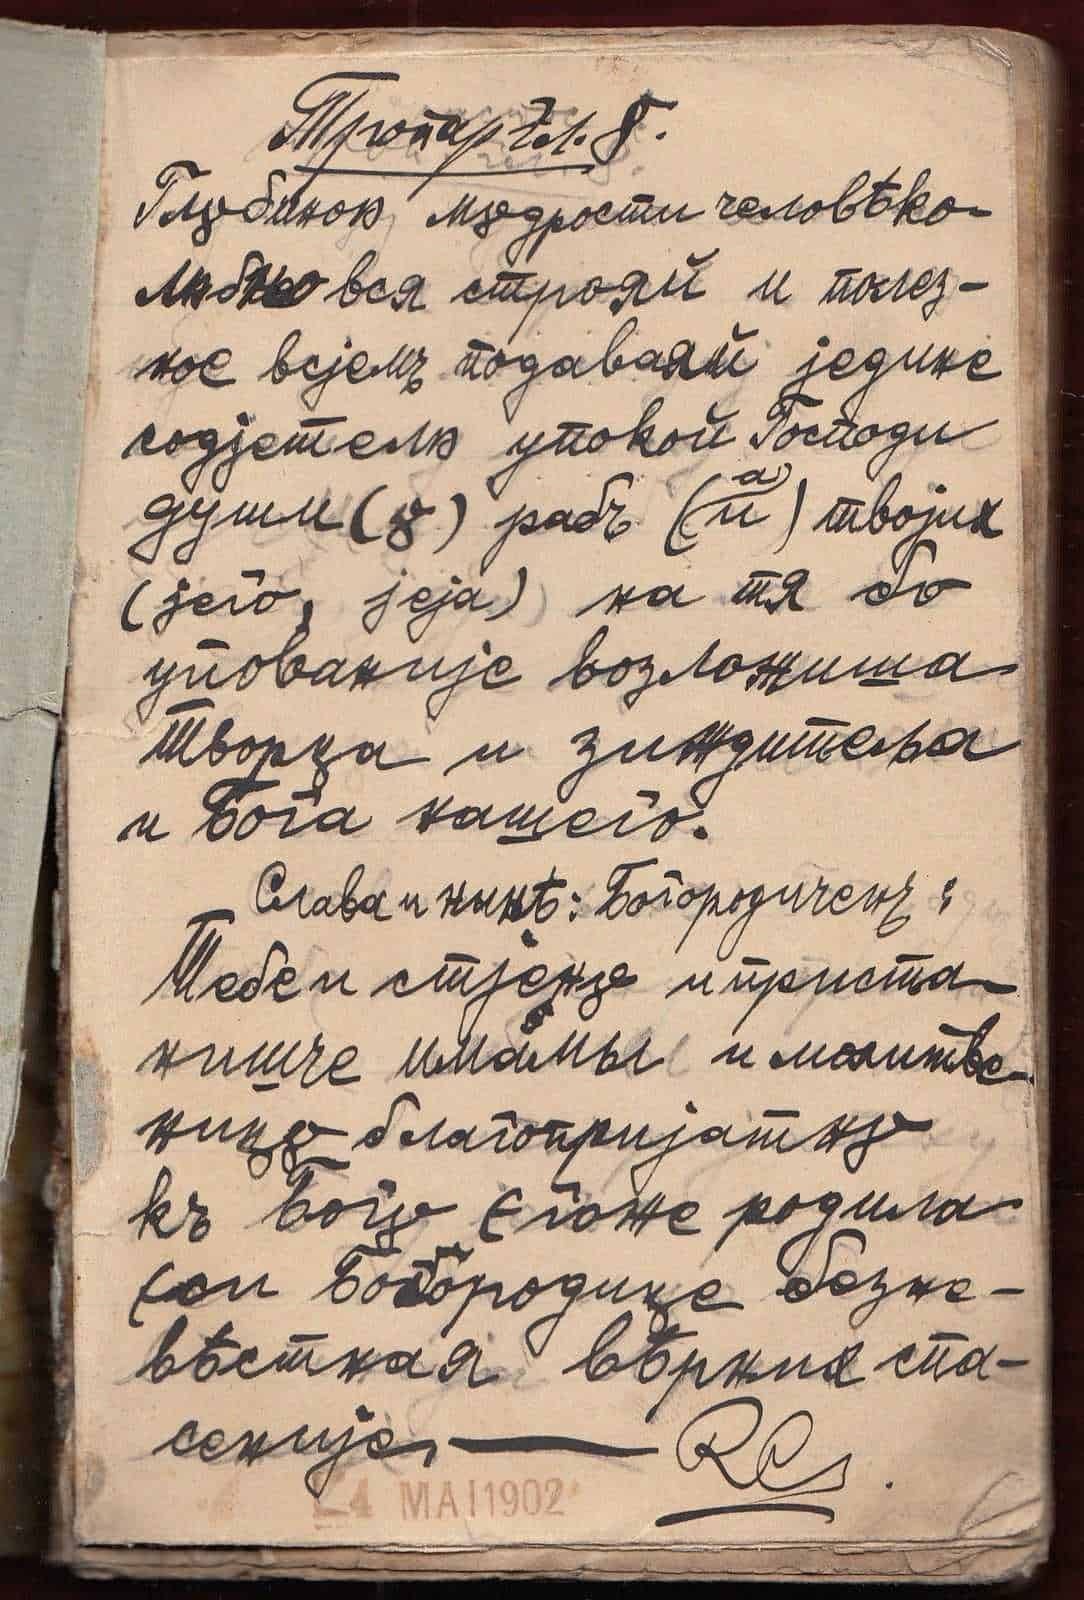 19c-Posledovanie-Acolouthia-e-Old-Slavonic-Inscribed-Manuscript-401146479031-2